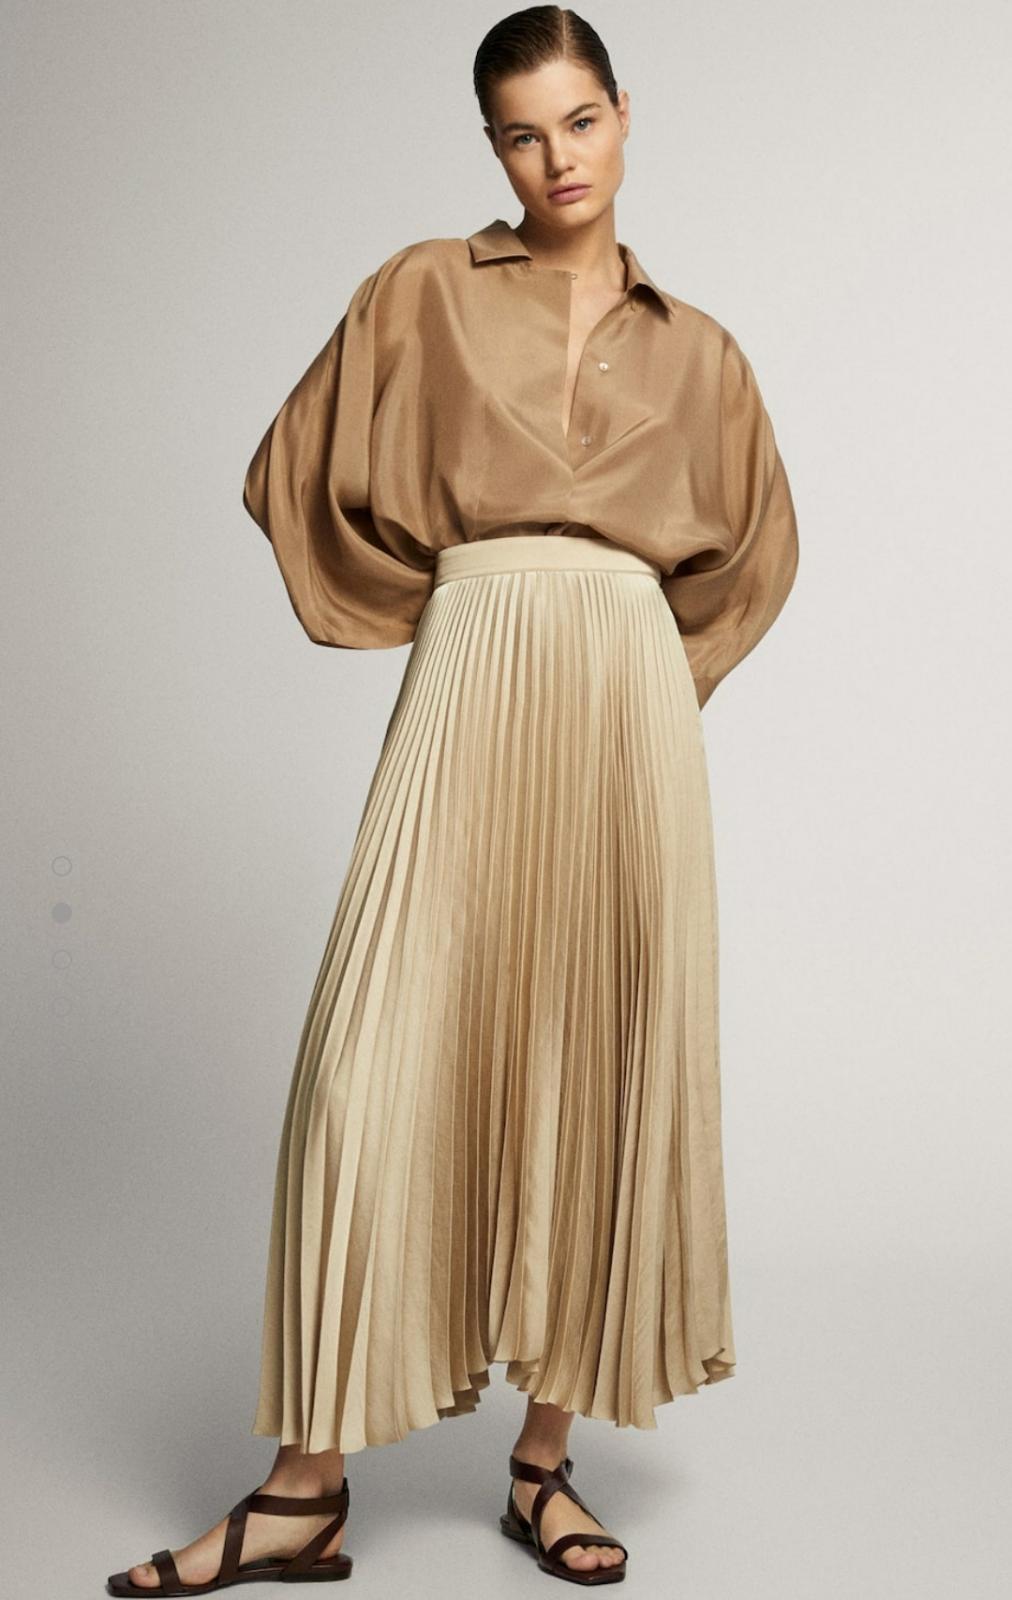 Falda plisada cinturilla en color dorado de Massimo Dutti 39'95€